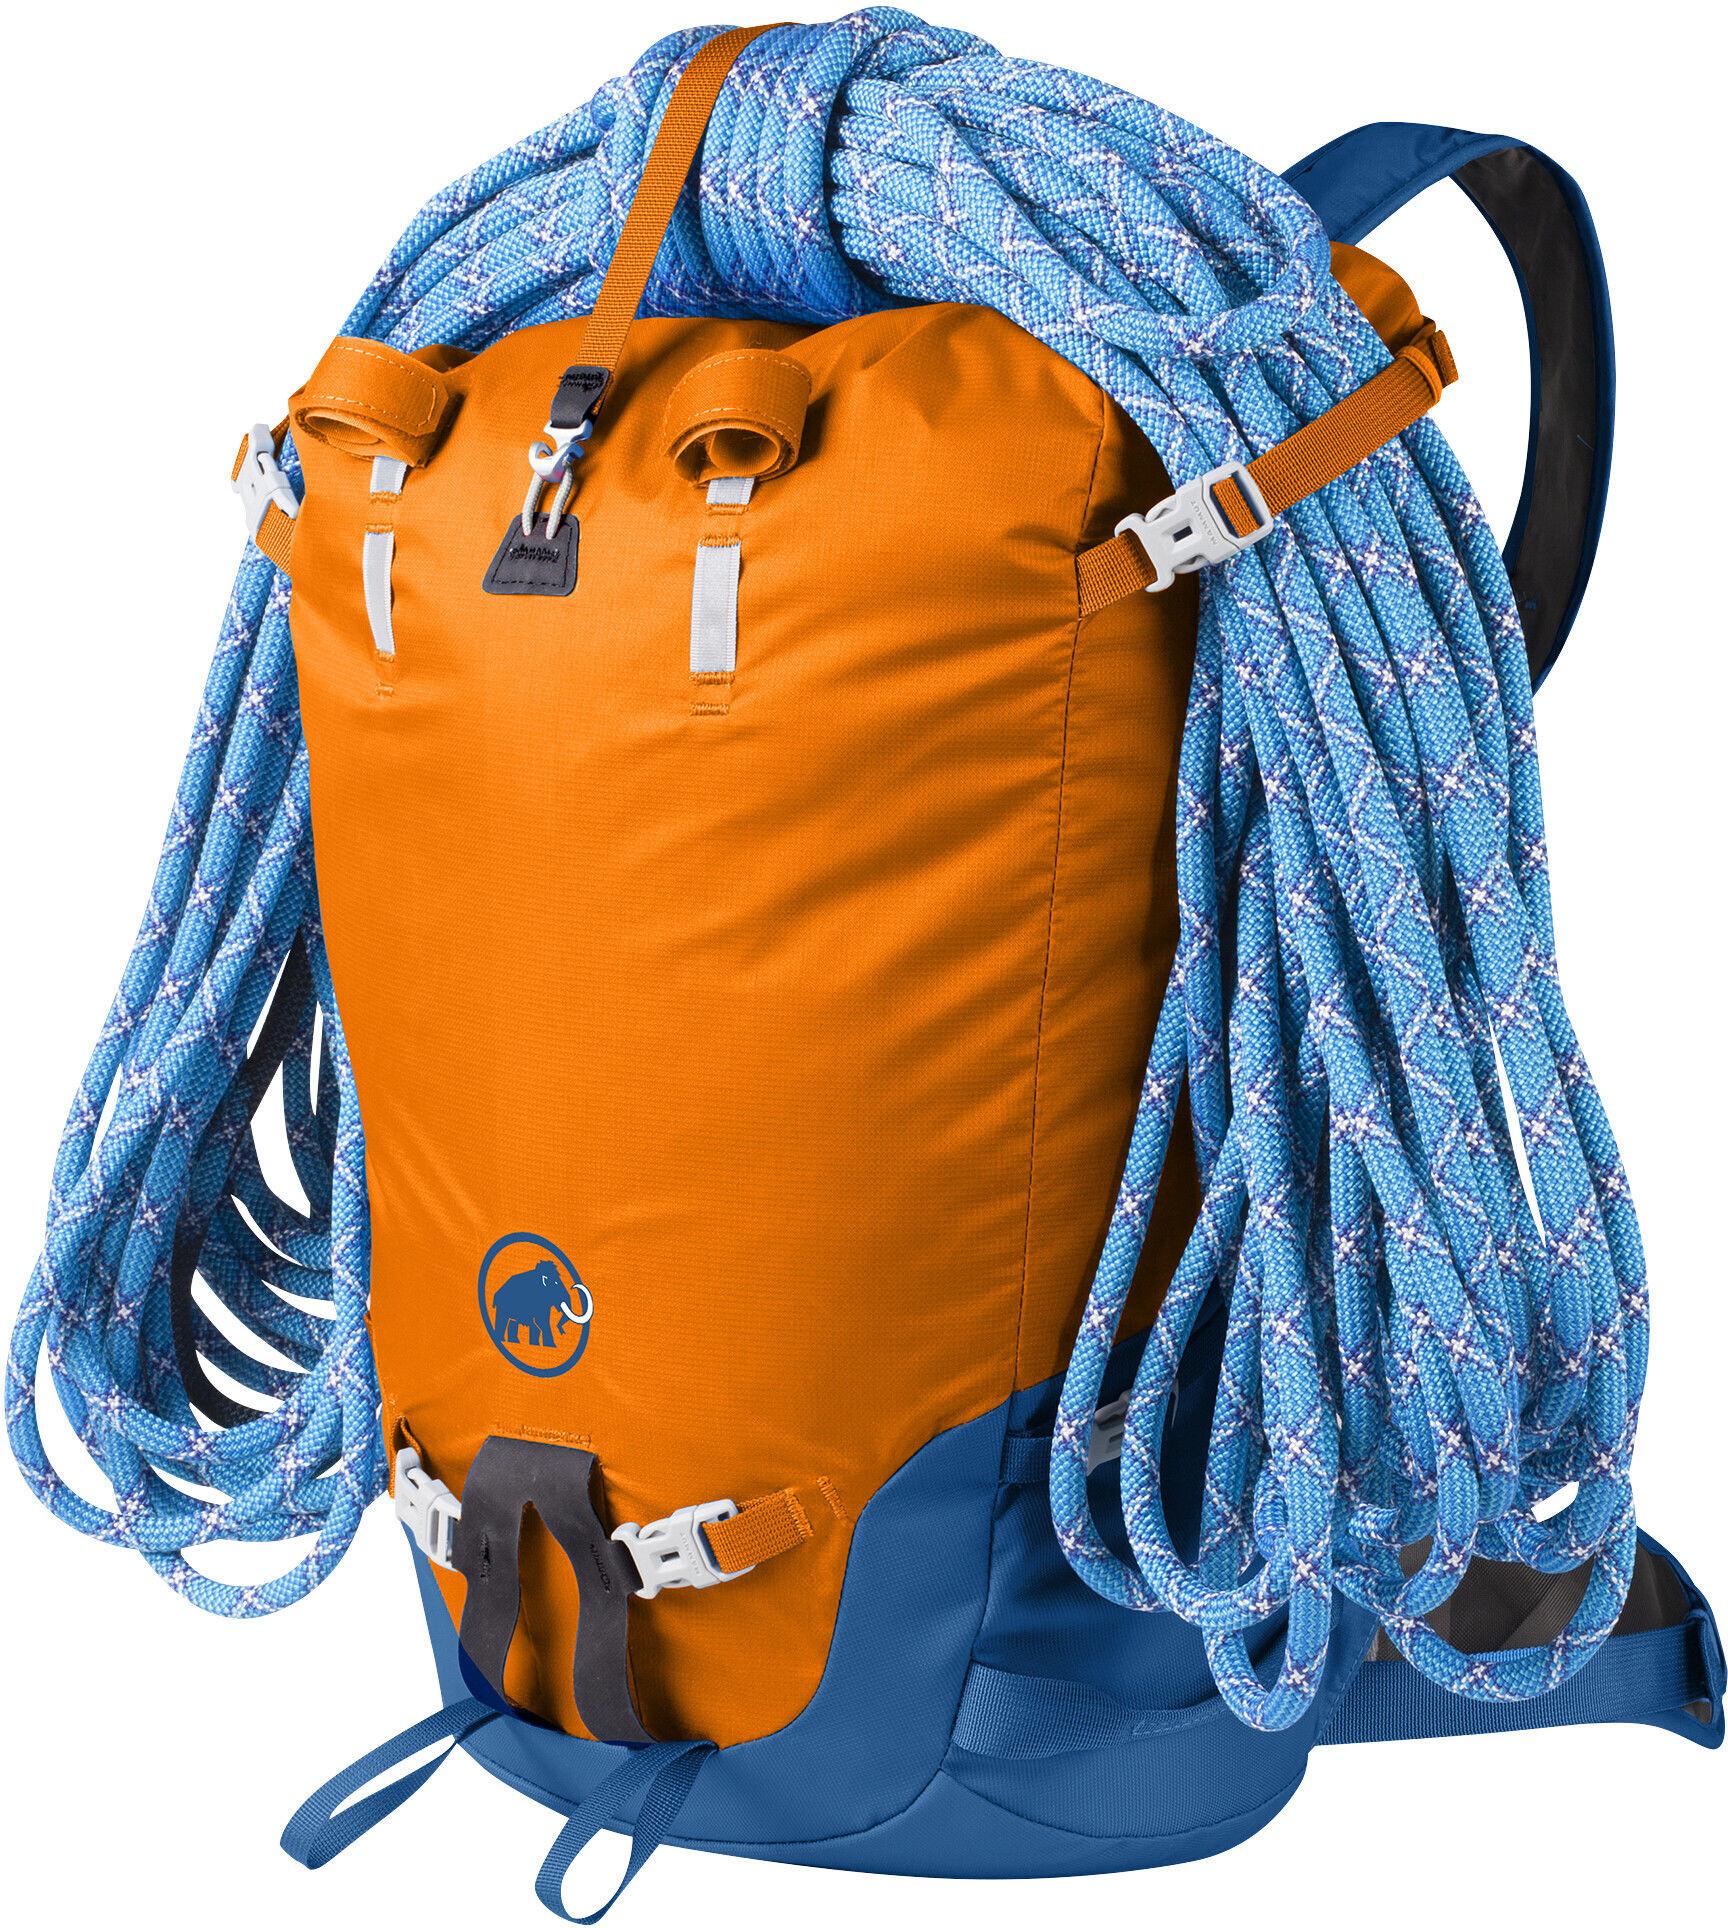 fb0328e997c1d Mammut Trion Light 28+ Plecak pomarańczowy | Sklep Addnature.pl